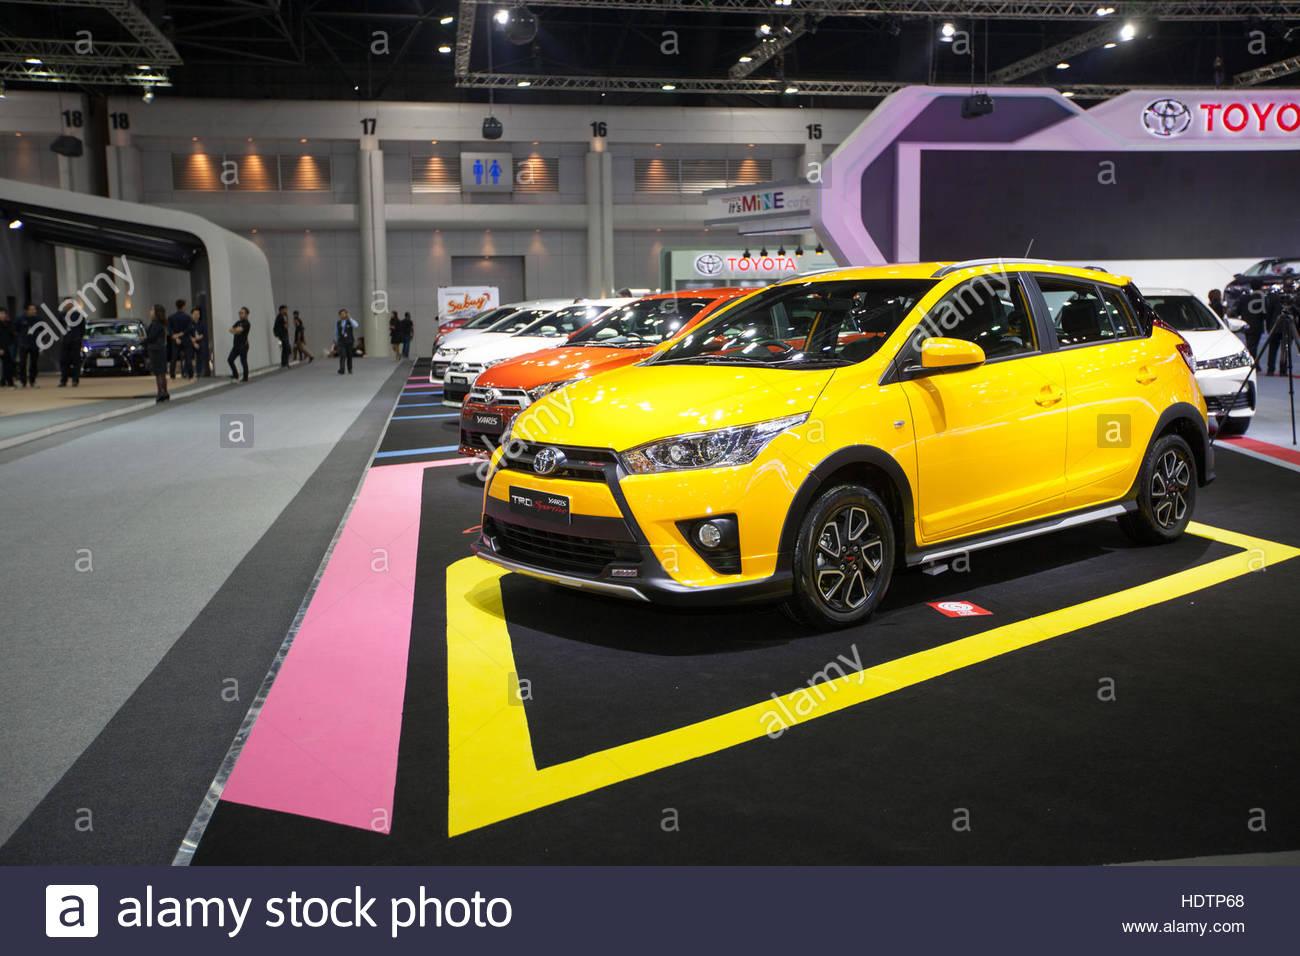 all new toyota yaris trd sportivo 2018 body kit grand veloz bangkok november 30 car on display at motor expo 2016 in thailand